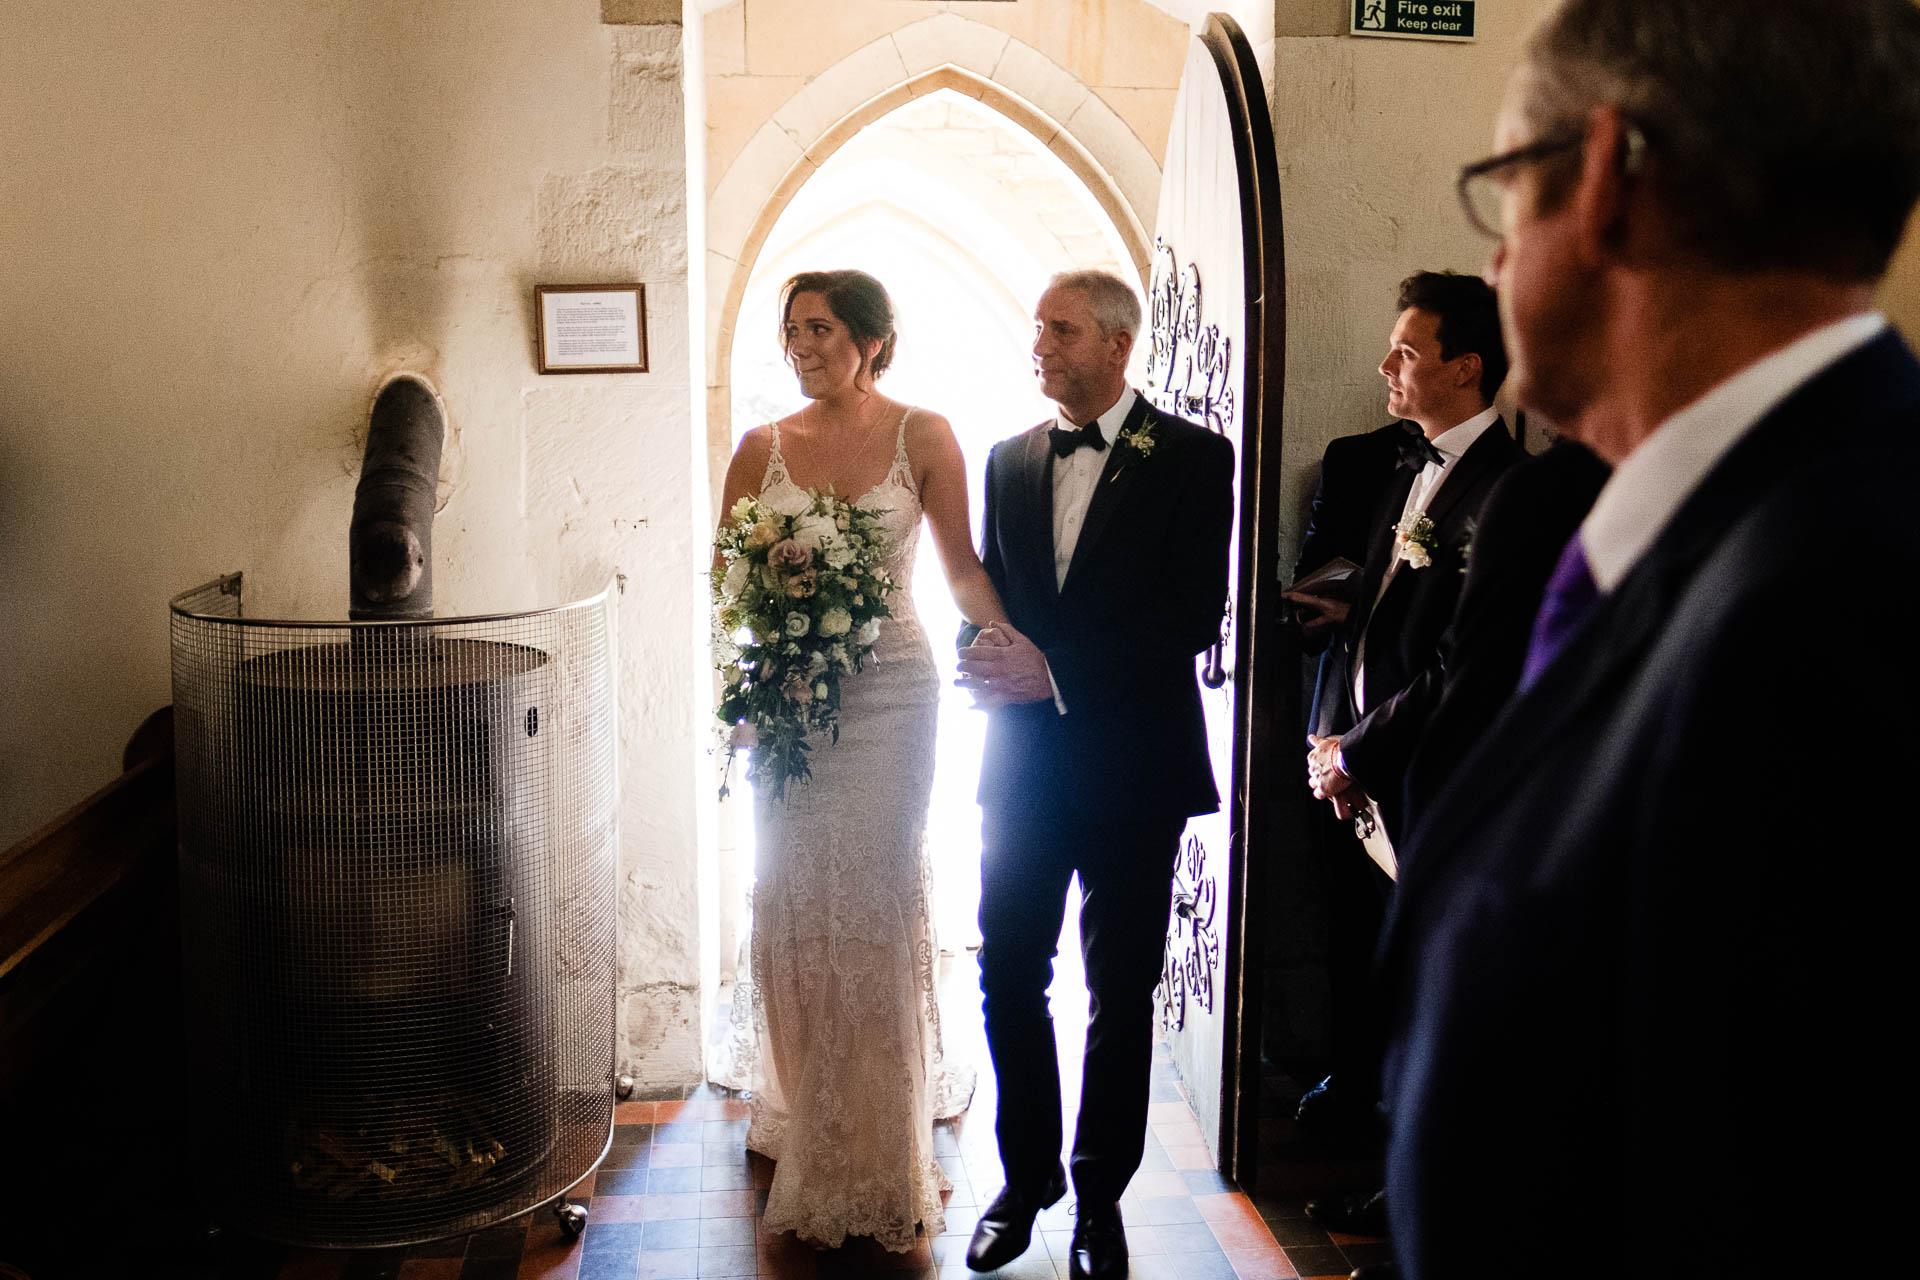 orchardleigh house wedding - Danni & Barney (118).jpg